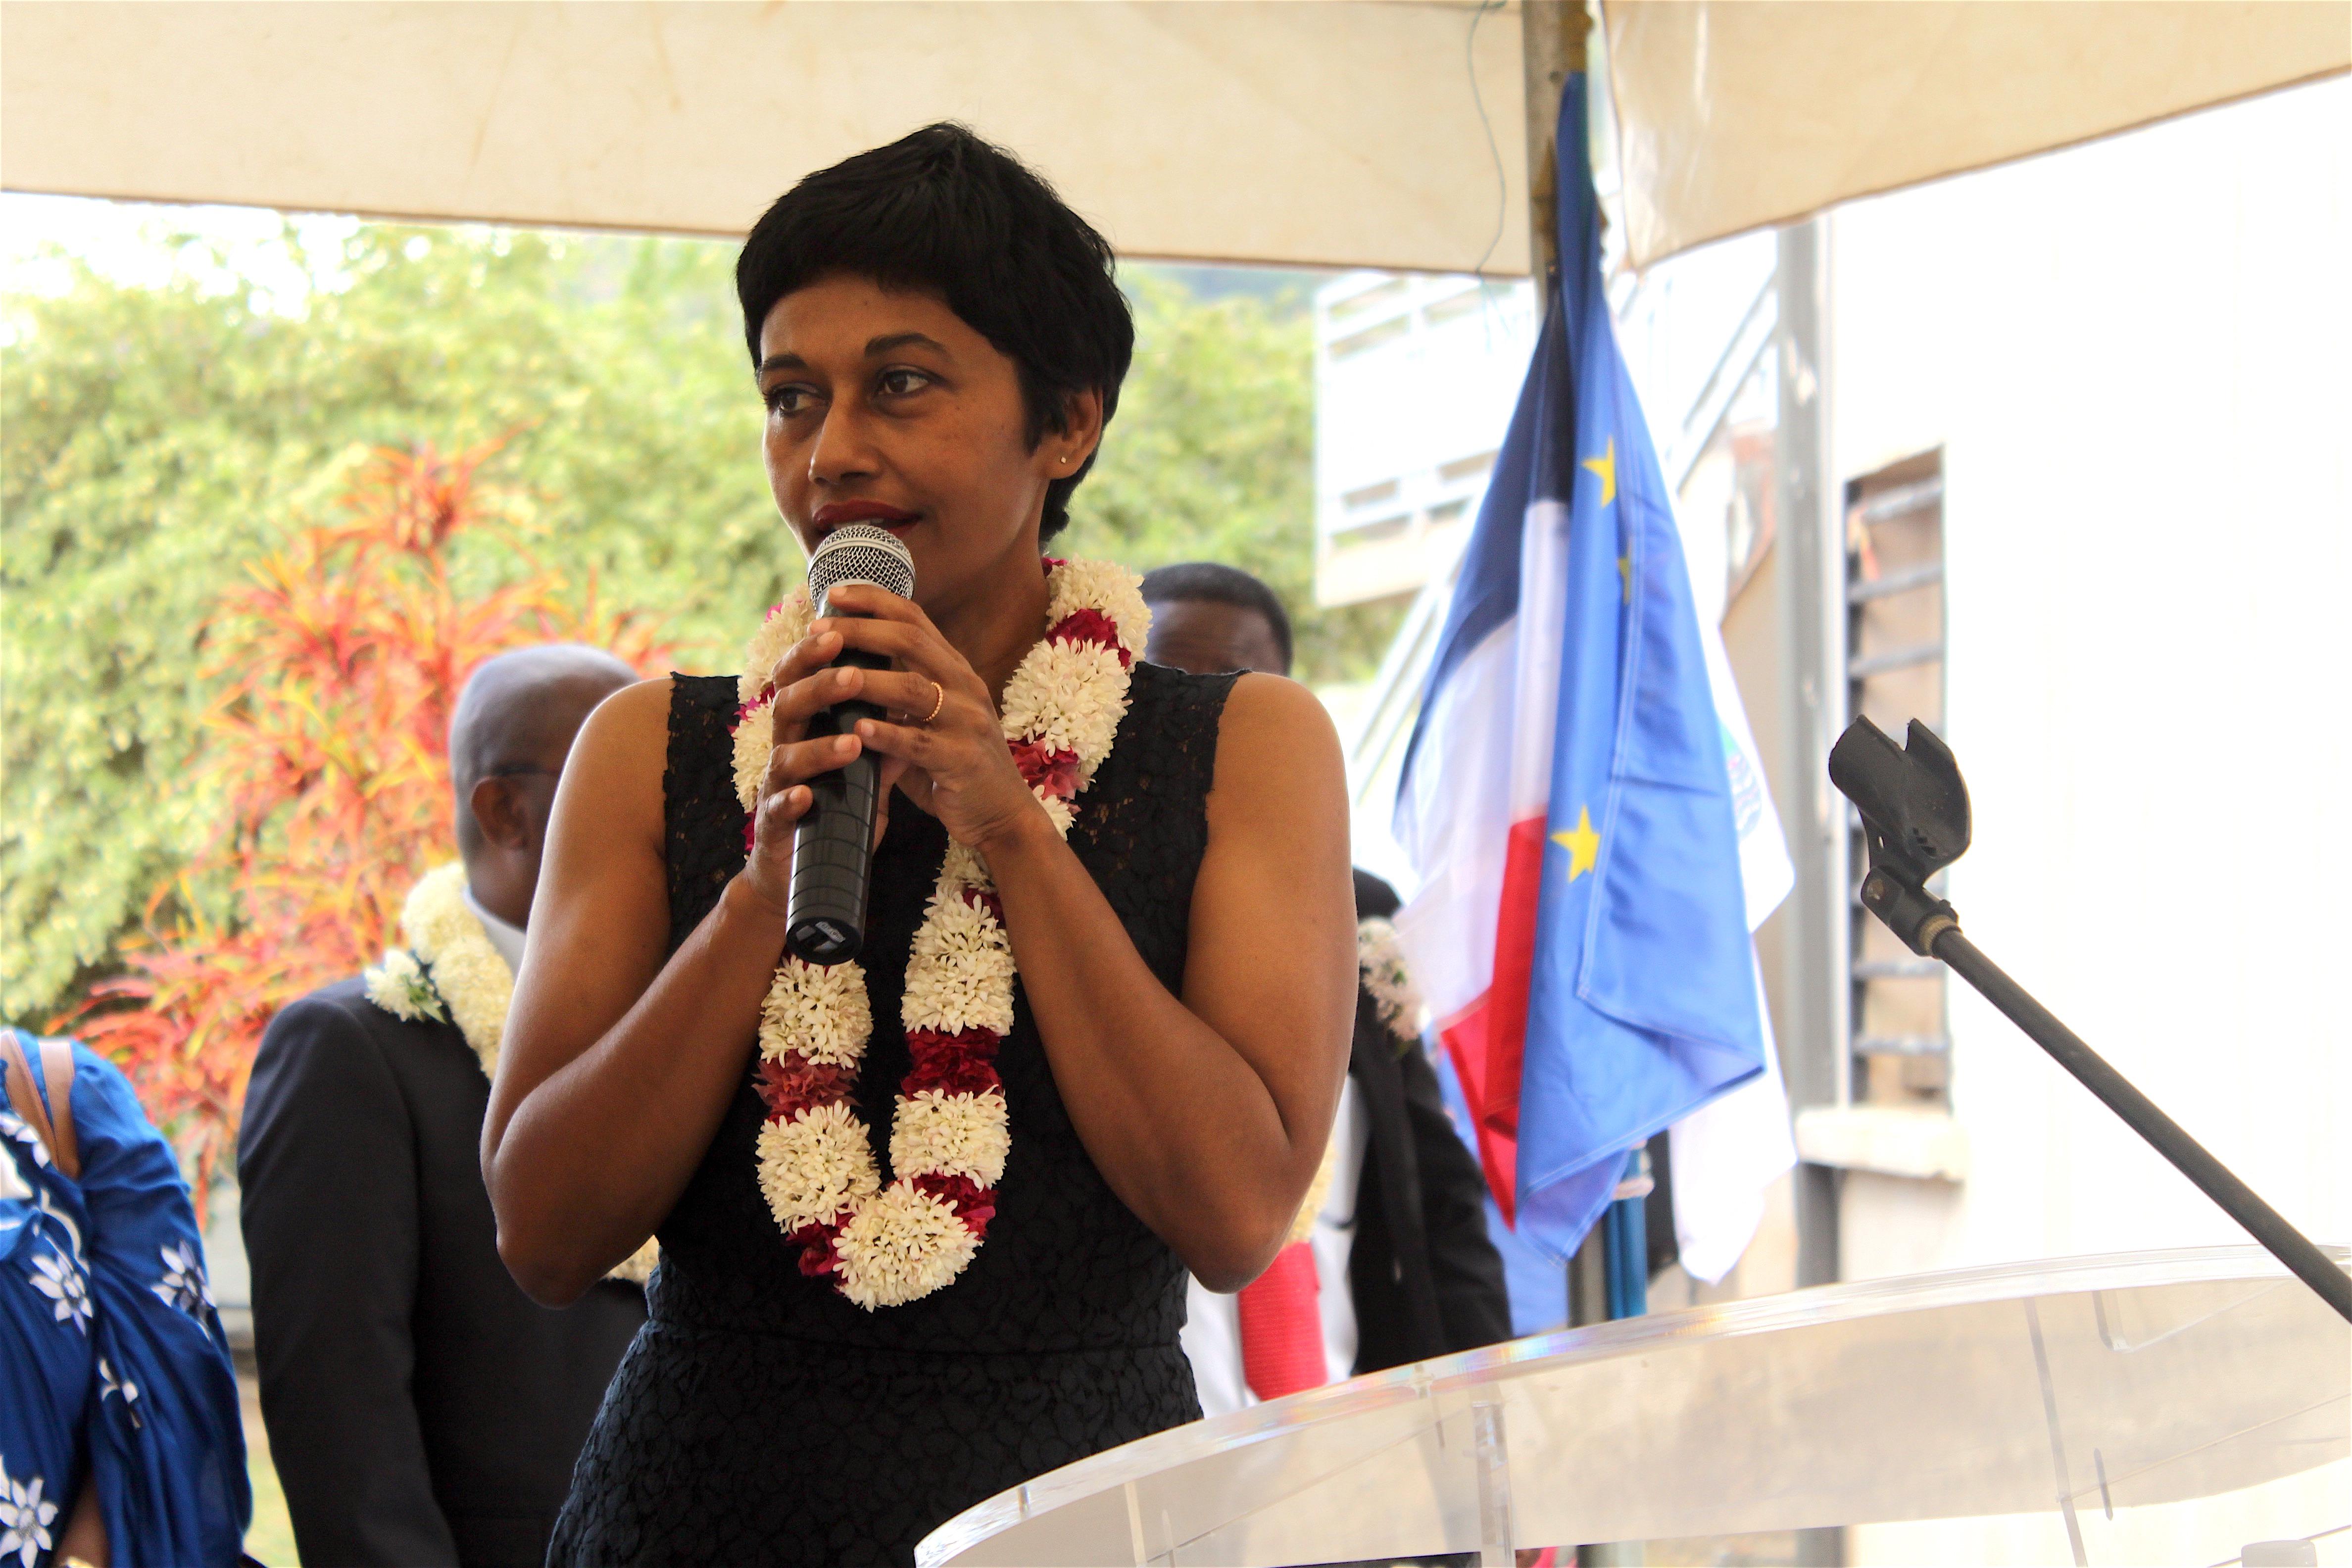 Inondations en Polynésie: jusqu'à 3 millions d'euros d'indemnisation, selon Ericka Bareigts